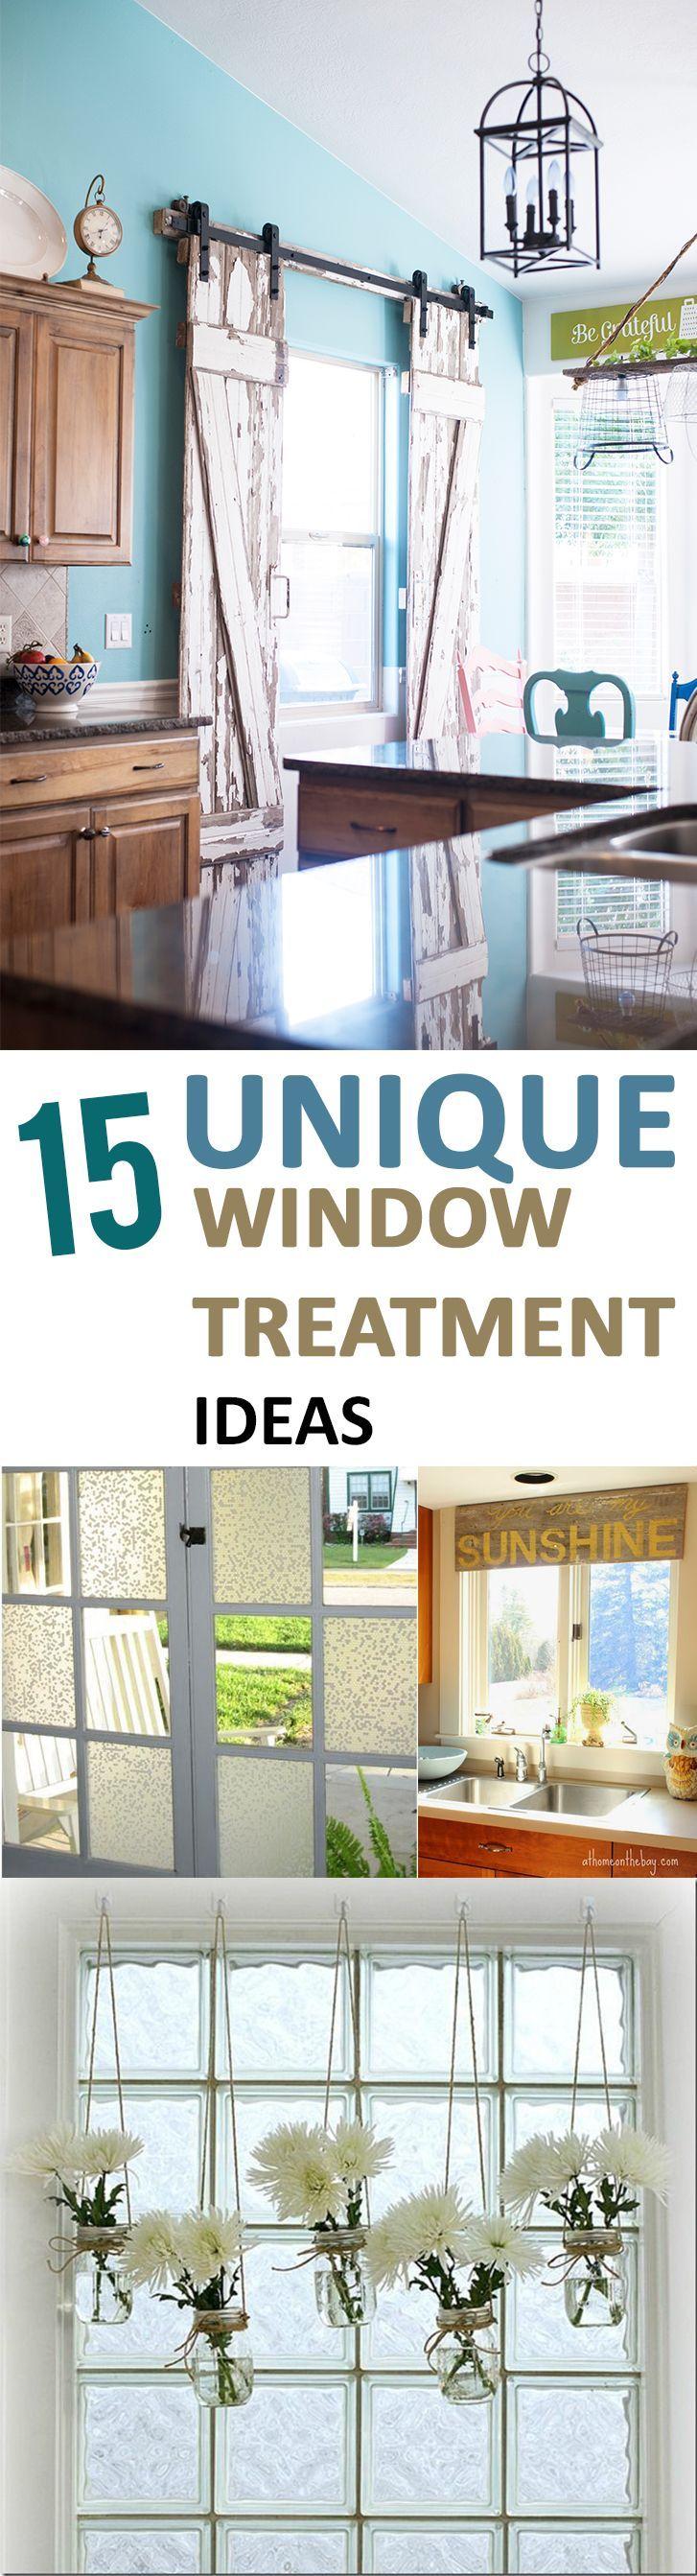 Home decor window   unique window treatment ideas  window unique window treatments